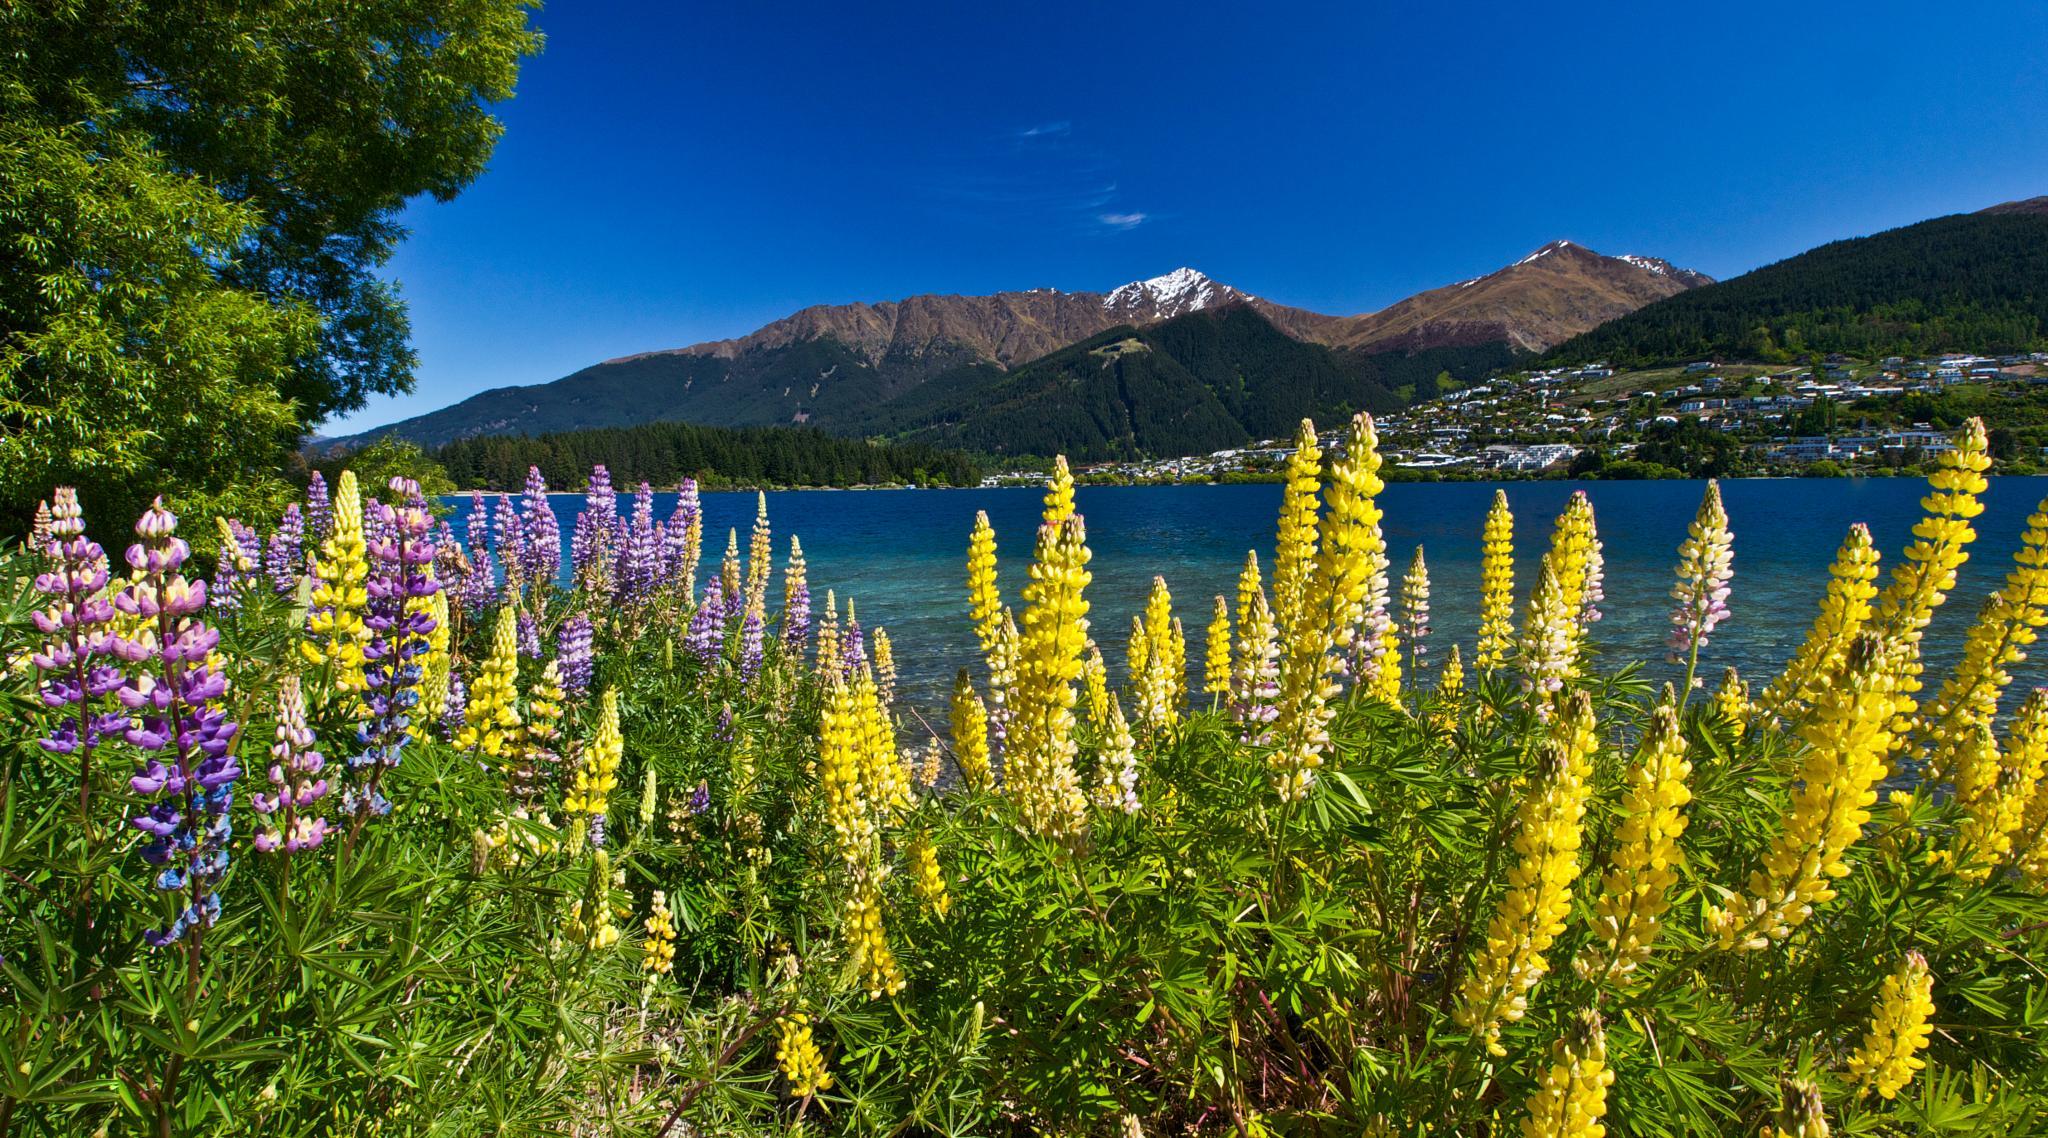 Queenstown NZ by Peter Edwardo Vicente.